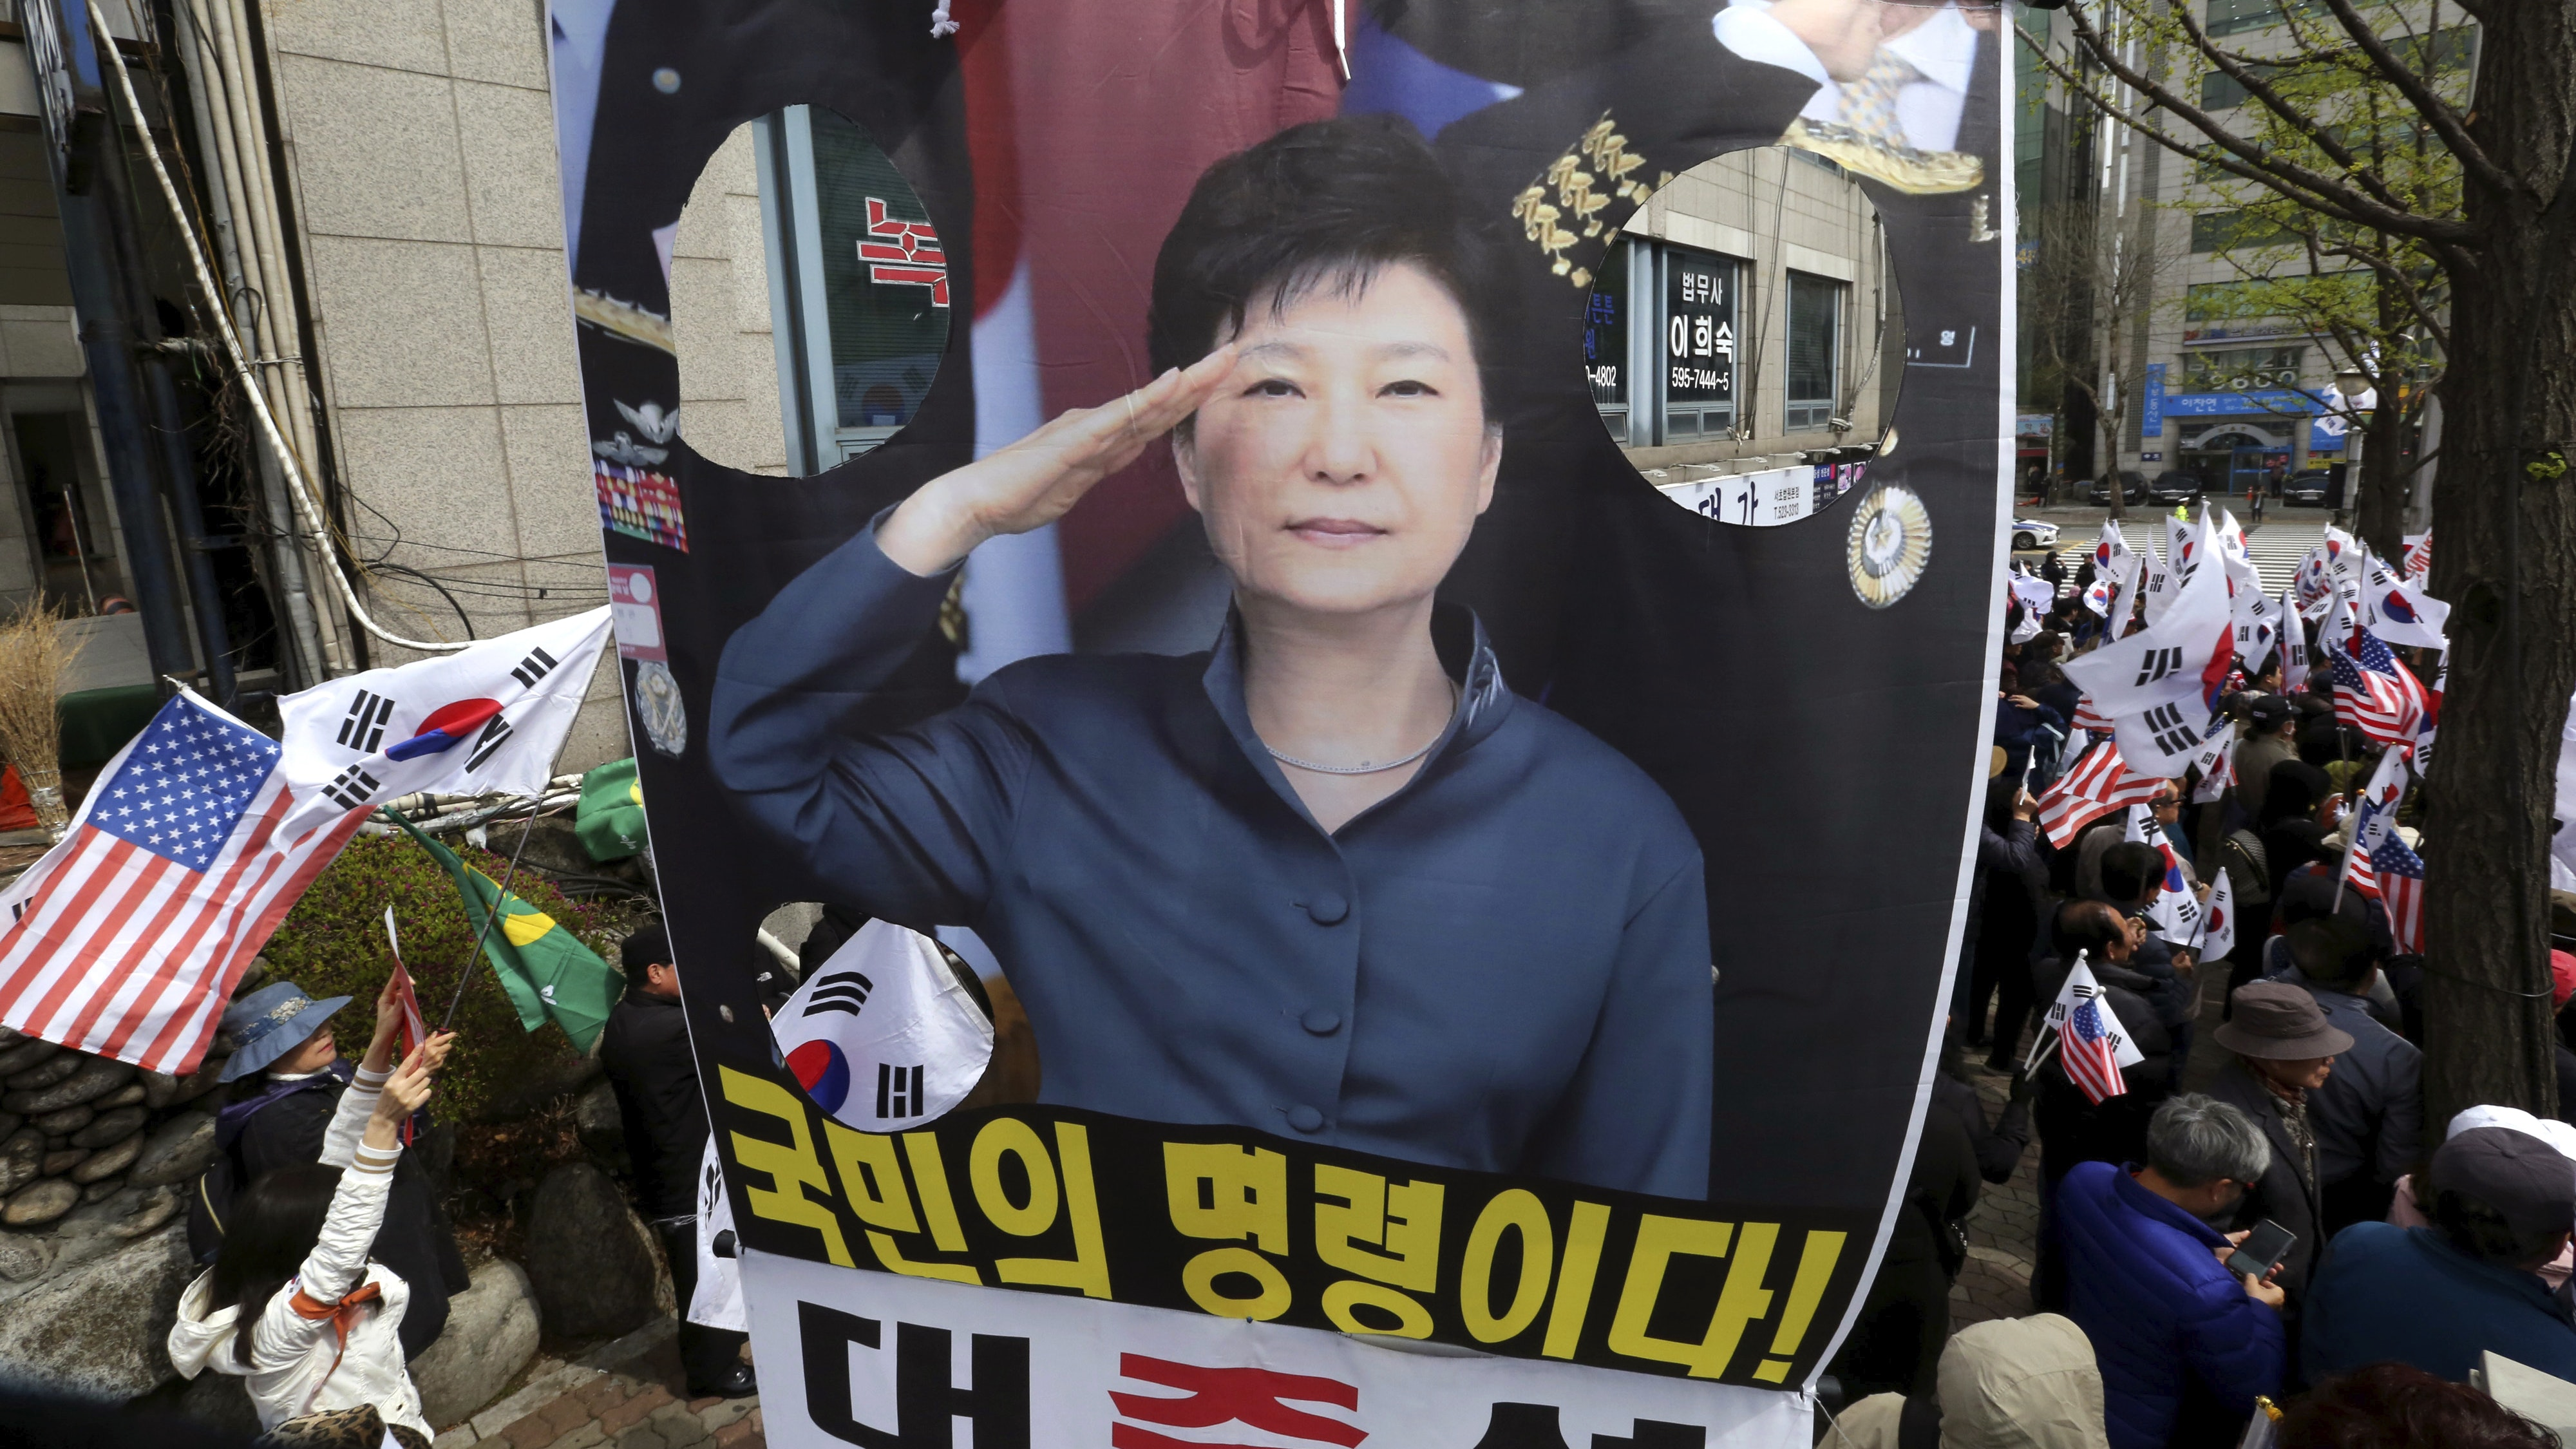 http://home.bt.com/images/former-south-korean-leader-park-jailed-for-24-years-over-corruption-136426283032402601-180406104038.jpg